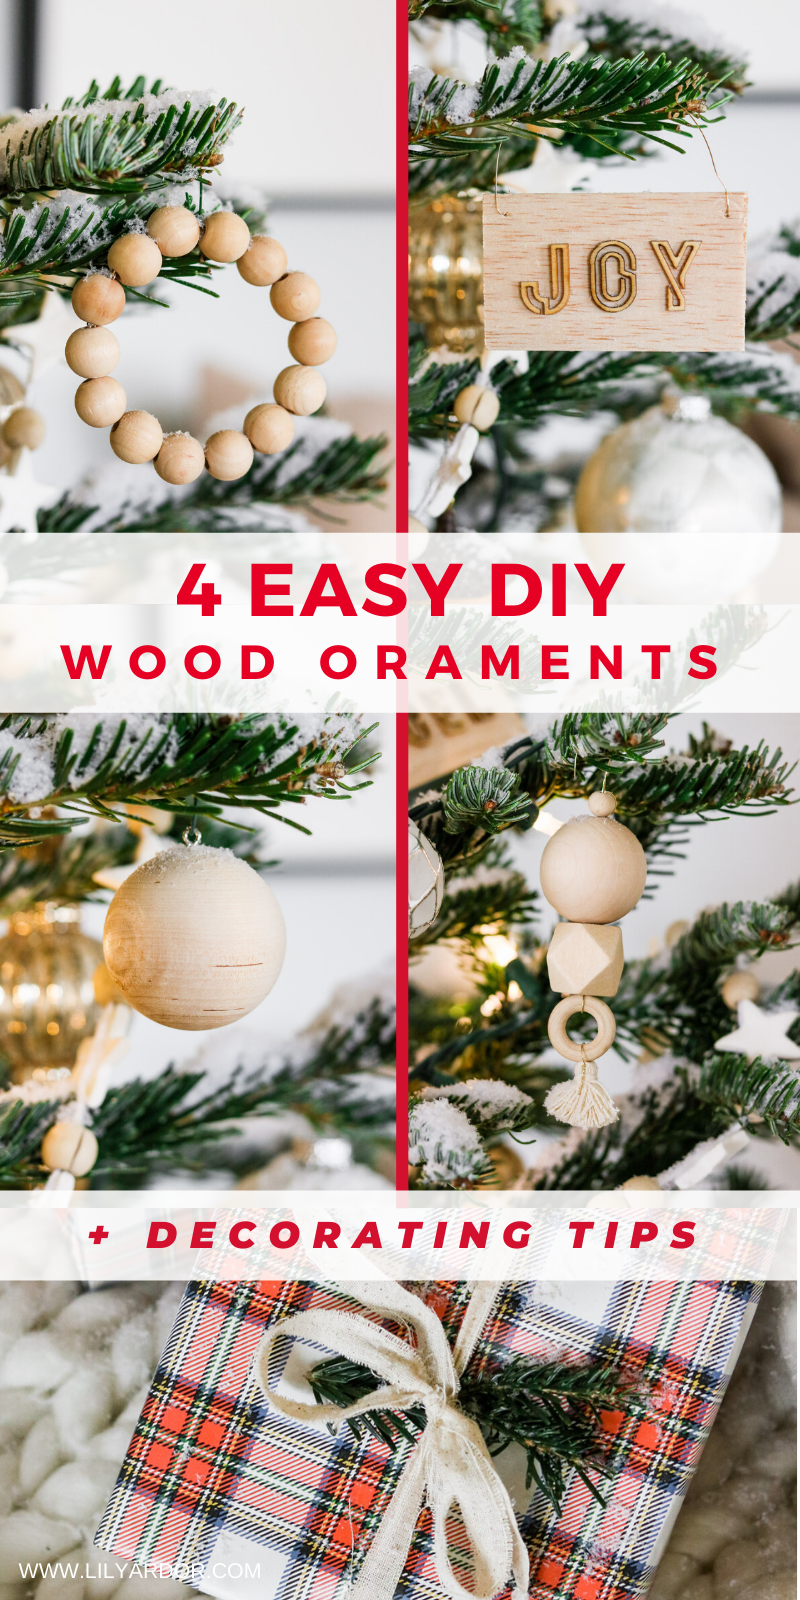 Diy Wood Ornaments 4 Ways Minimalist Tree Decor Diy Tree Decor Wood Christmas Ornaments Wood Ornaments